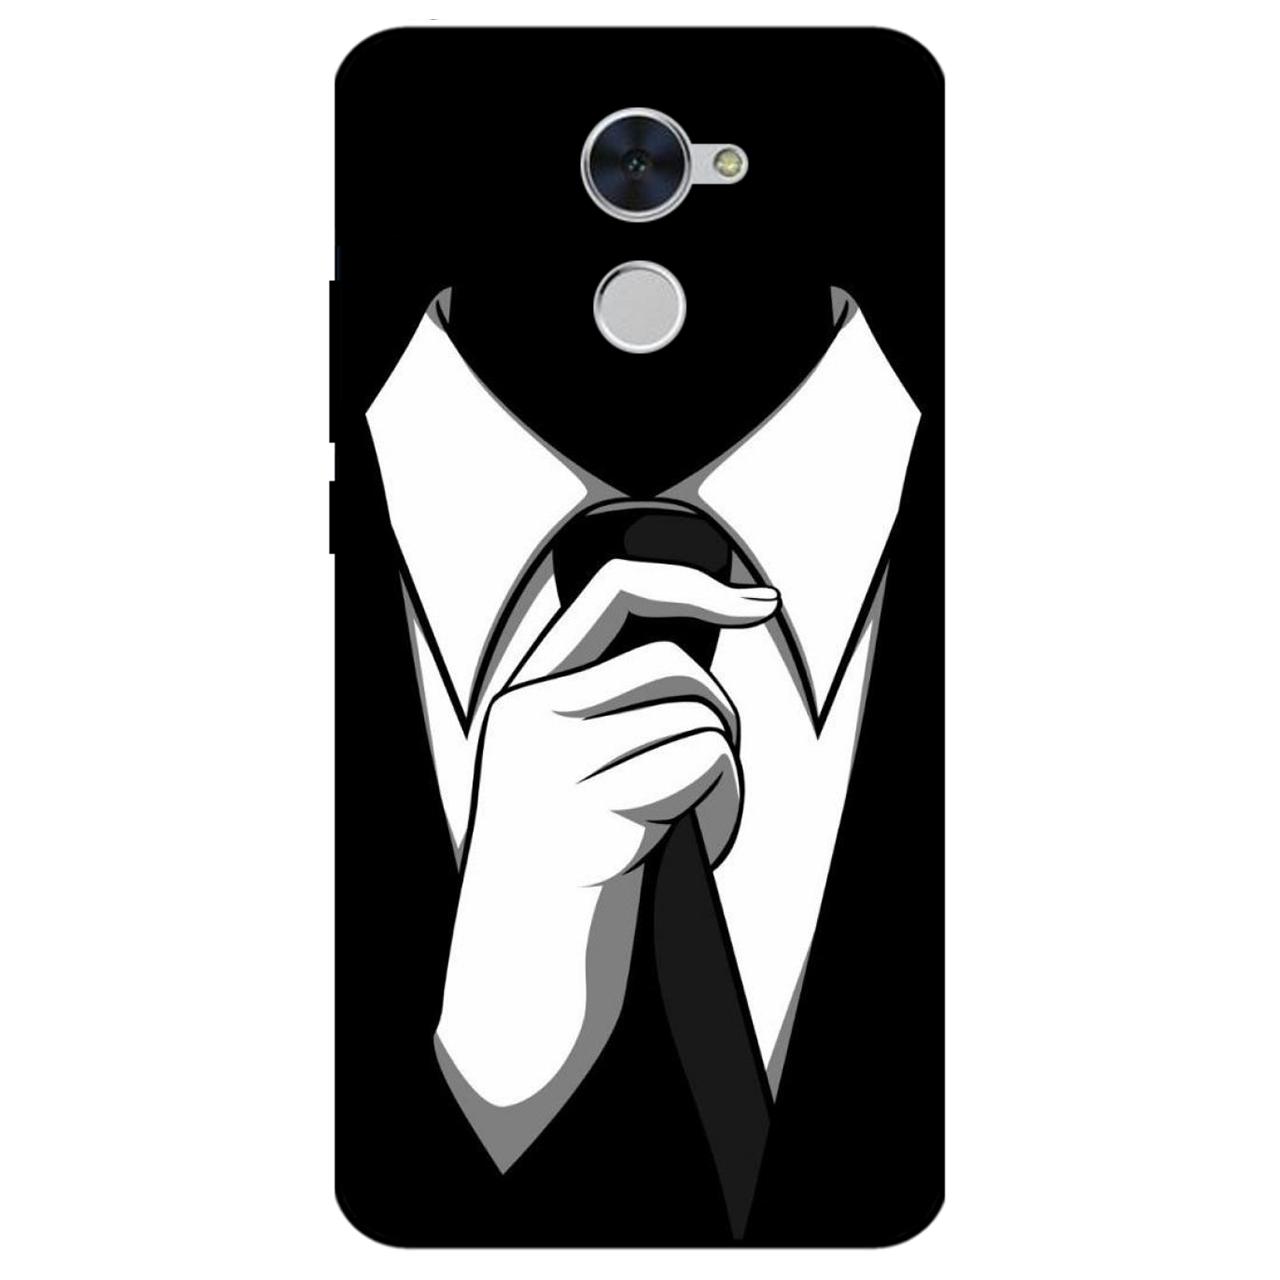 کاور کی اچ کد 7131 مناسب برای گوشی موبایل هوآوی Y7 Prime 2017